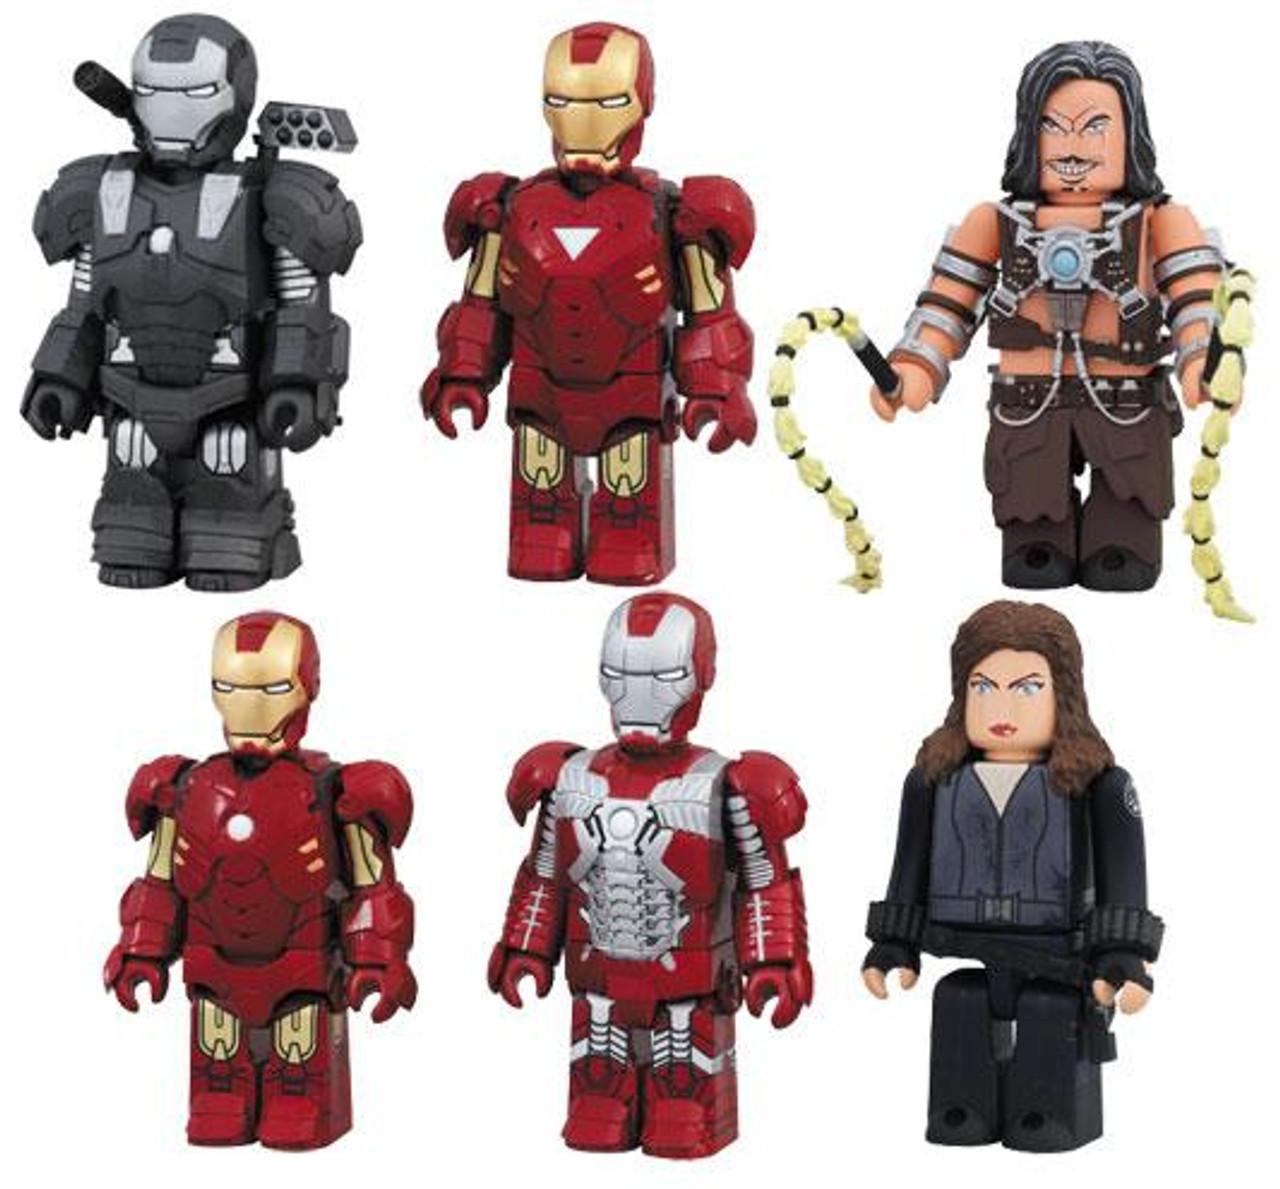 Kubrick Iron Man 2 Set of 6 Minifigures